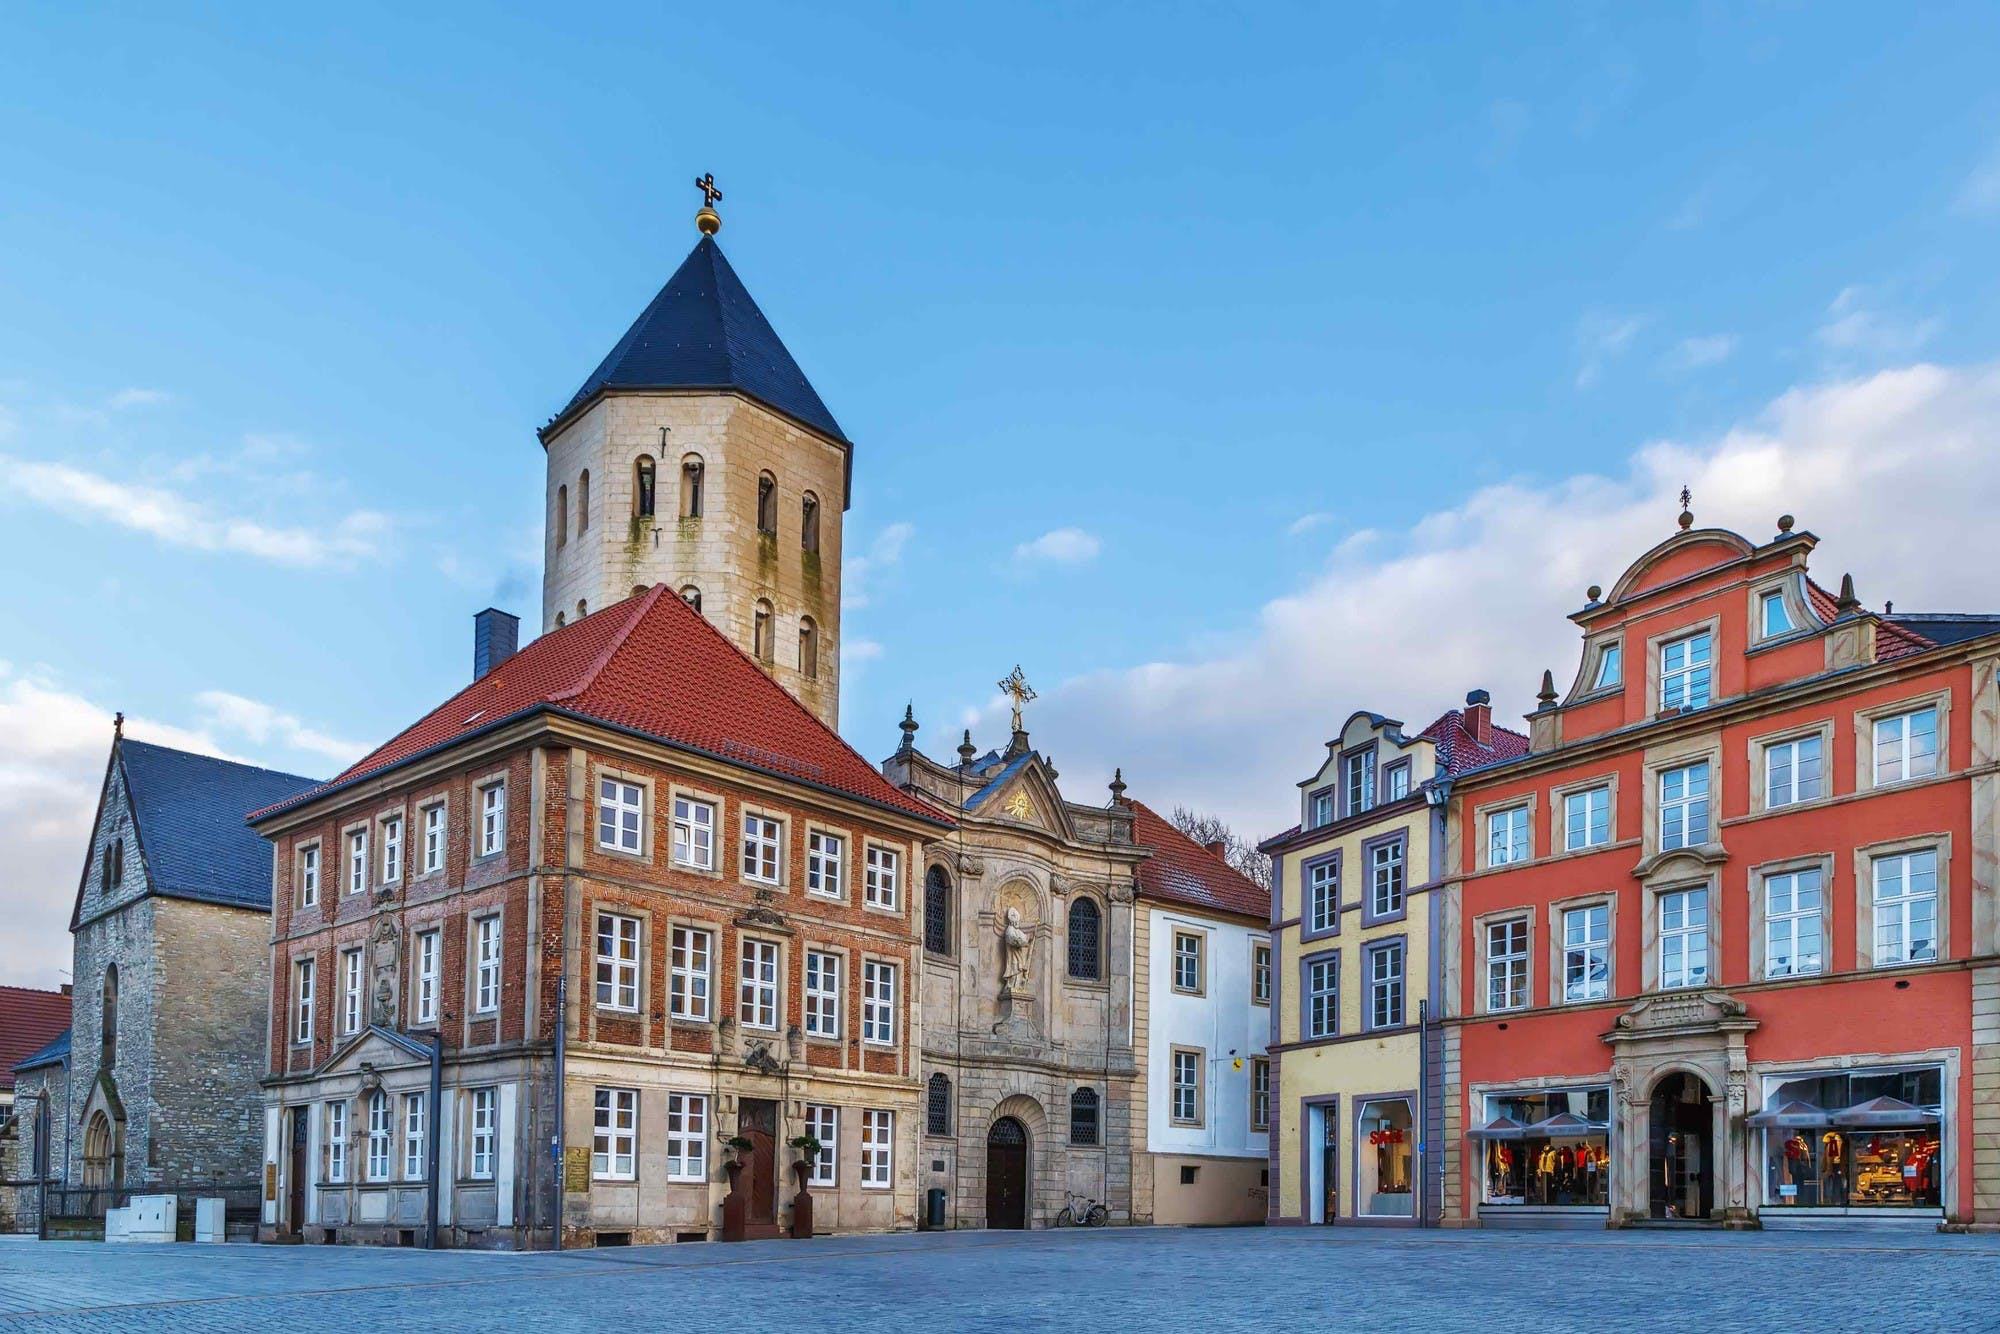 Huren Paderborn